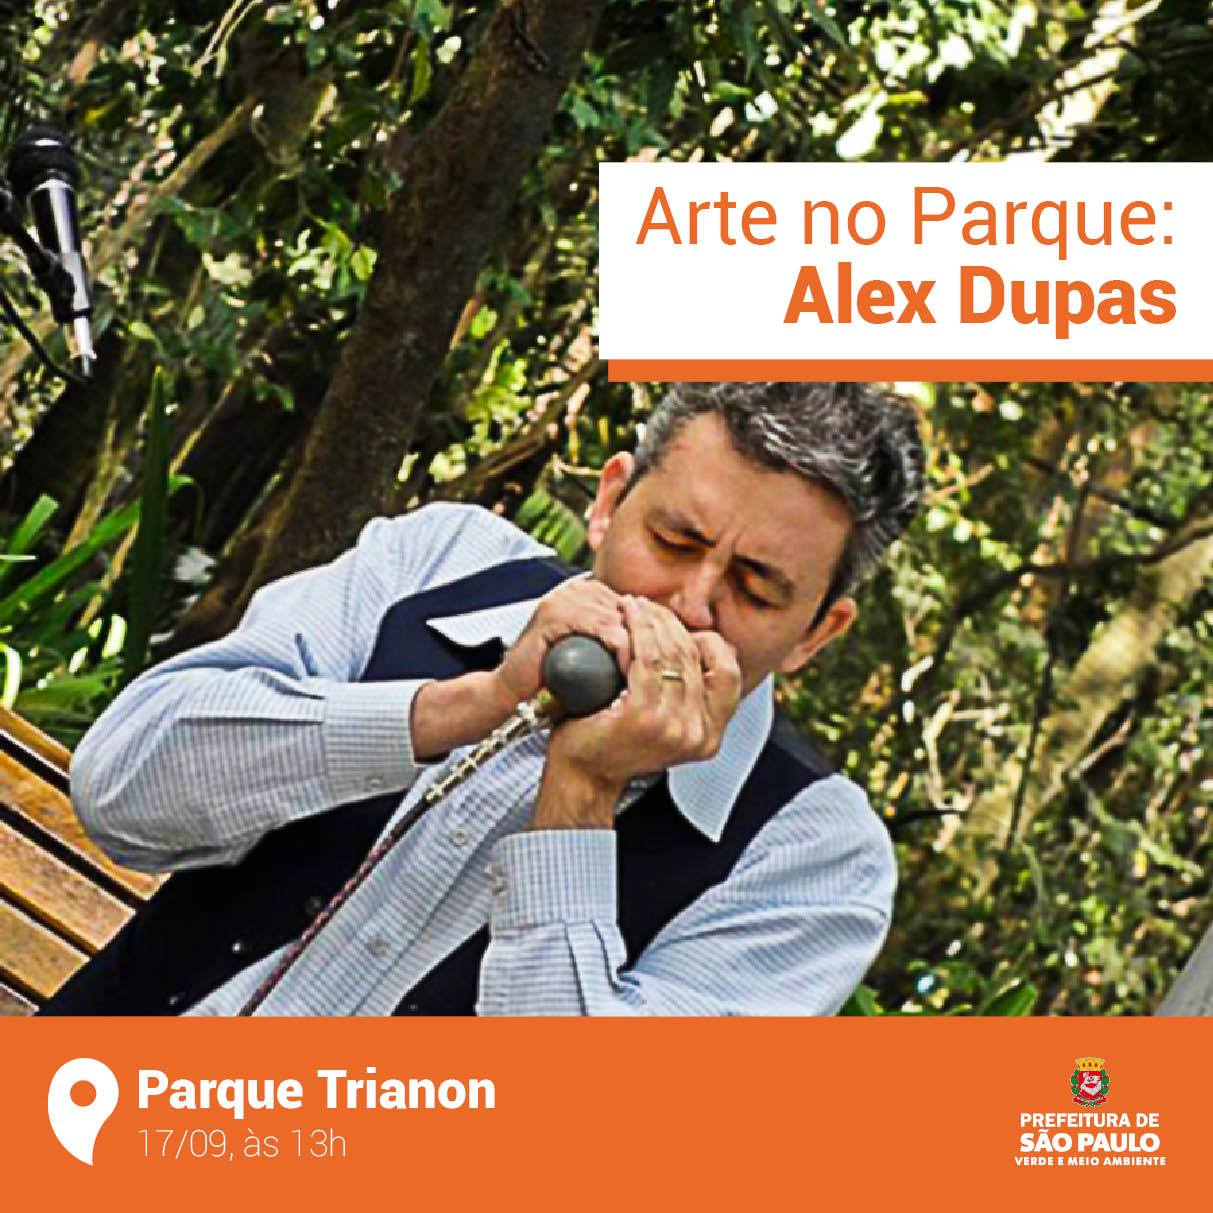 Parque Trianon 17-09-2014